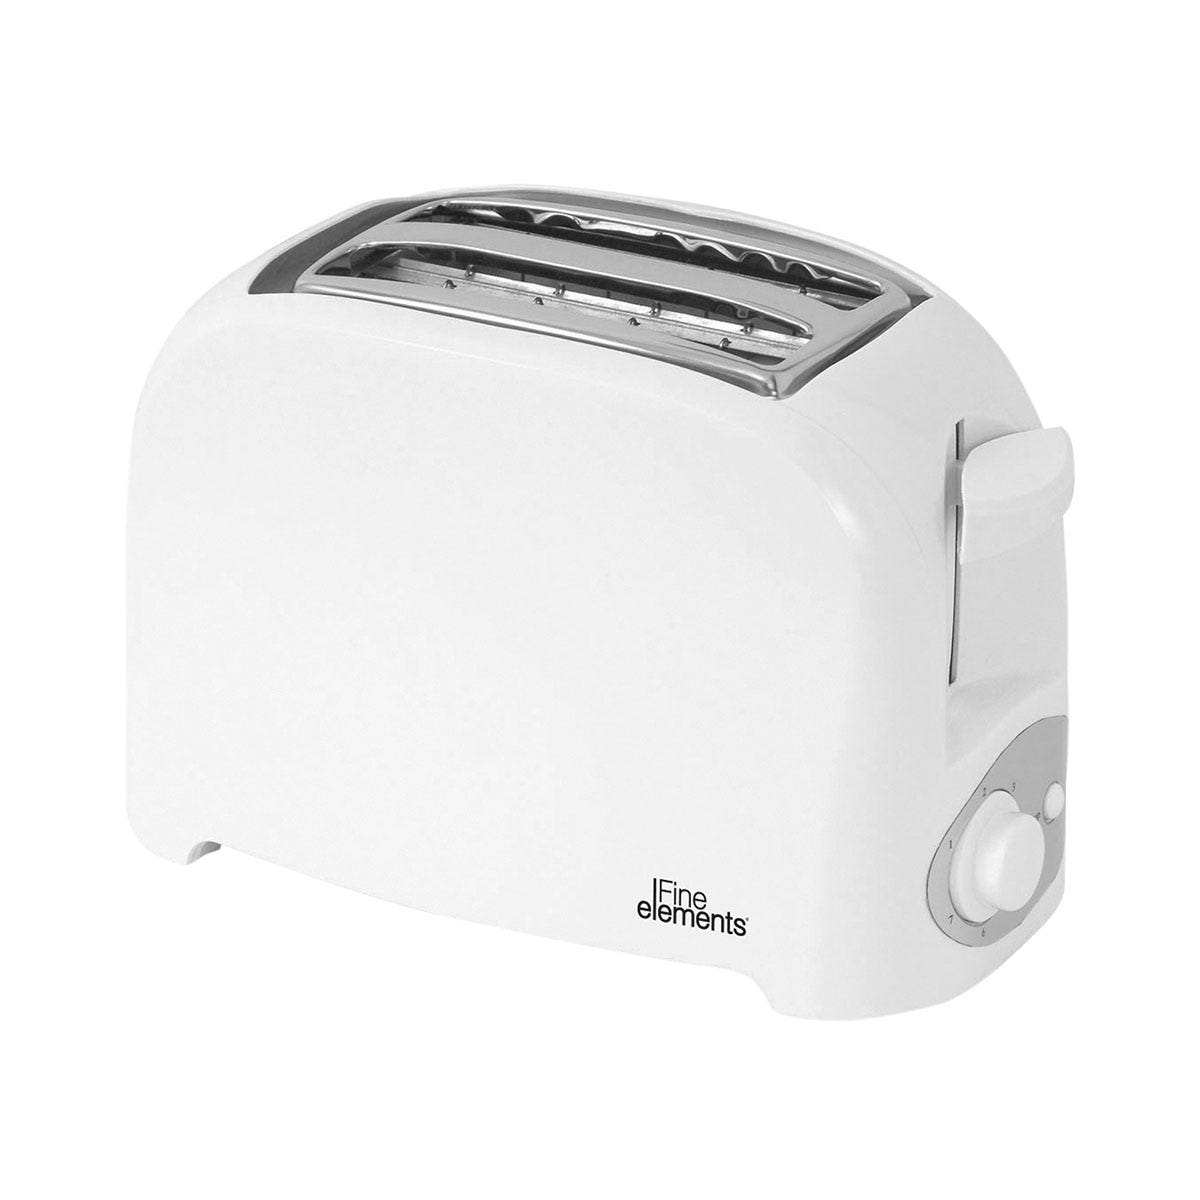 Fine Elements SDA1008GE 870W 2-Slice Toaster - Pure White